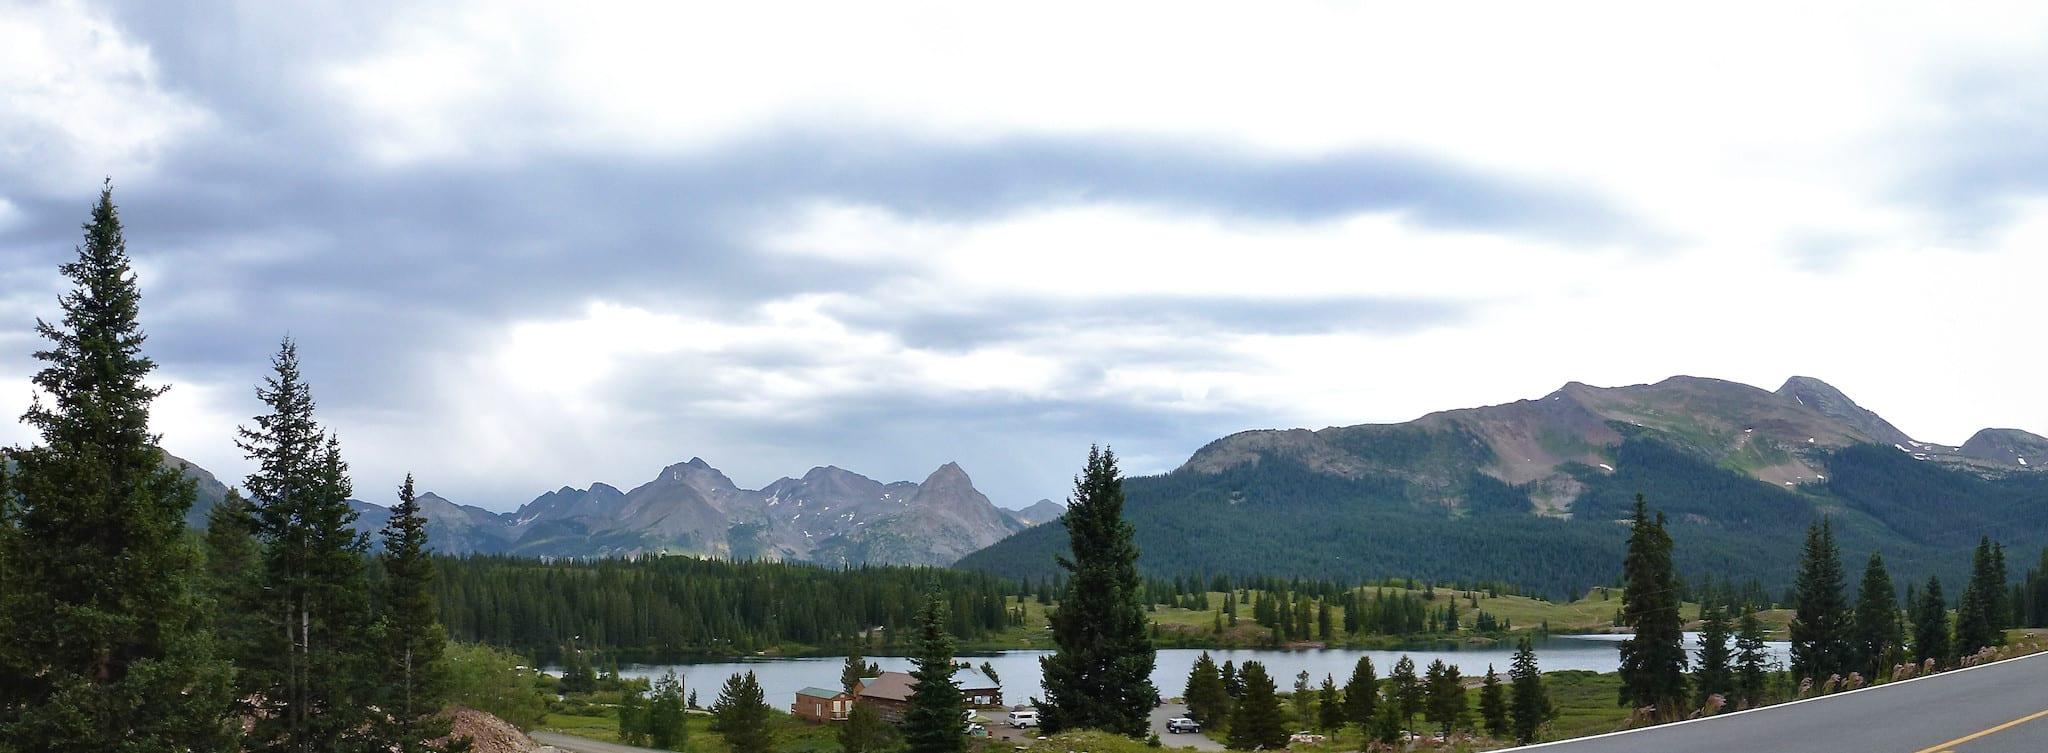 Molas Lake Park and Campground Silverton CO